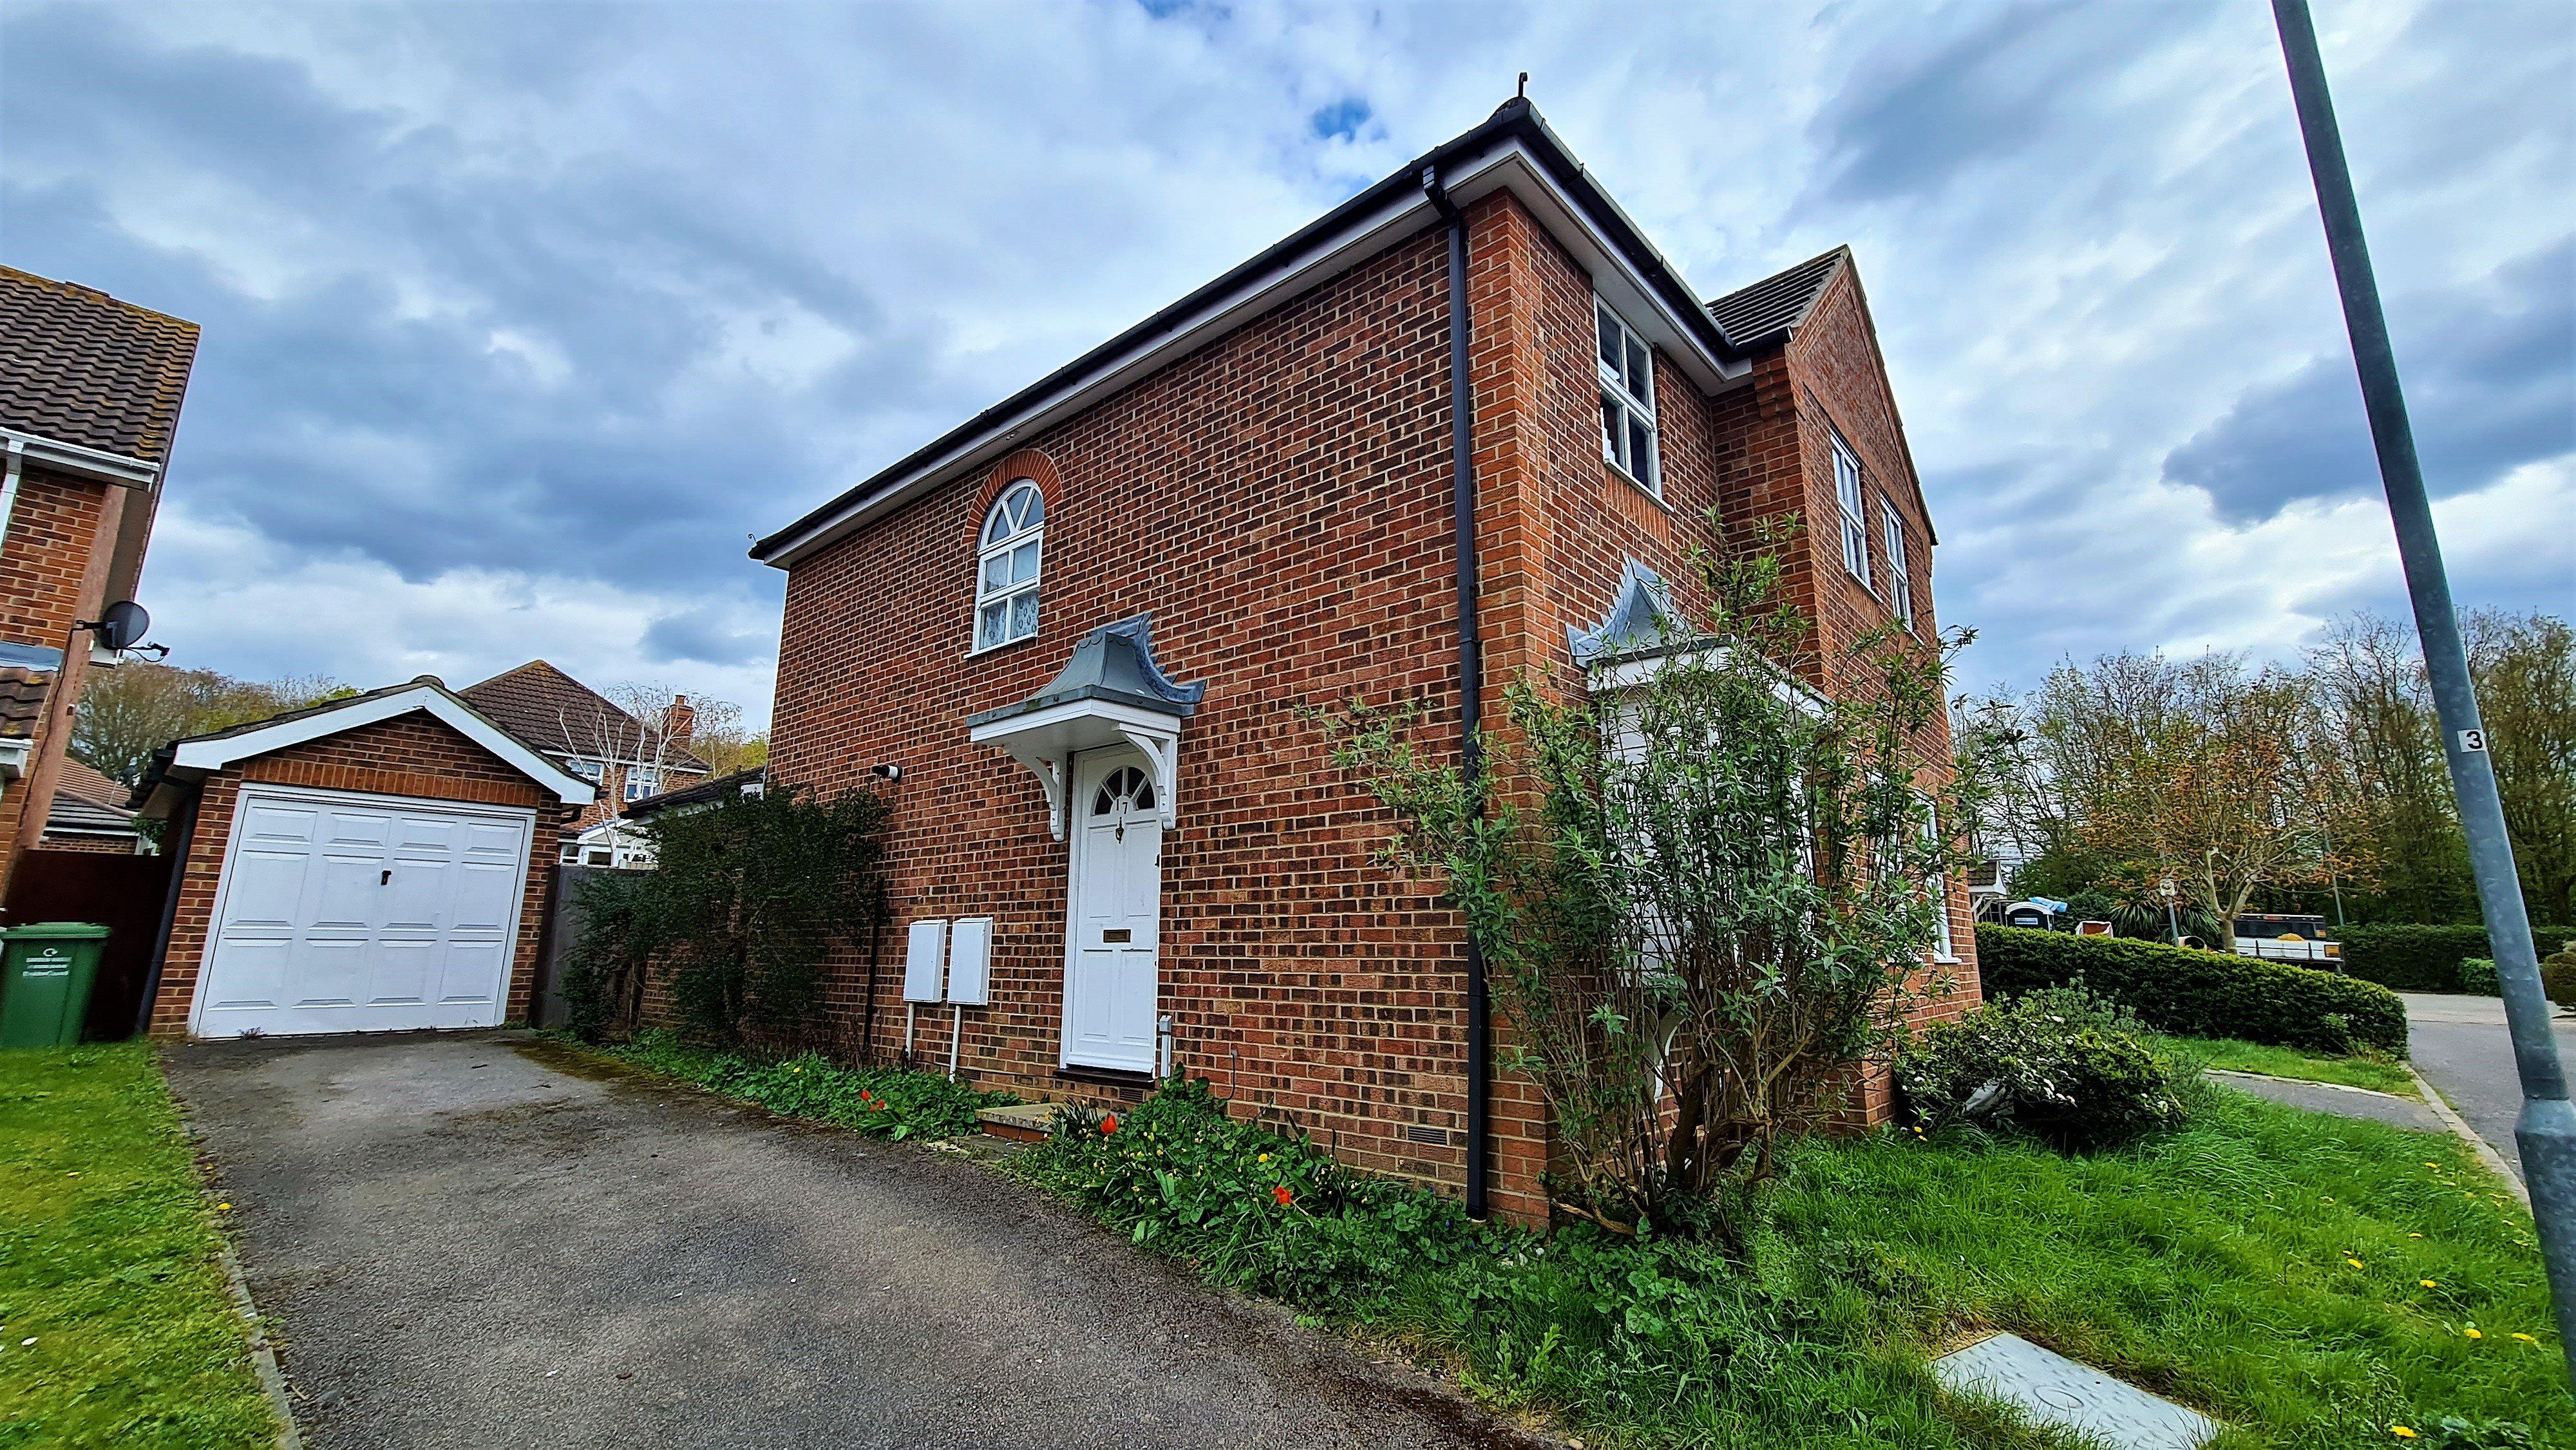 4 bed detached house for sale in Oakham Close, Langdon Hills - Property Image 1